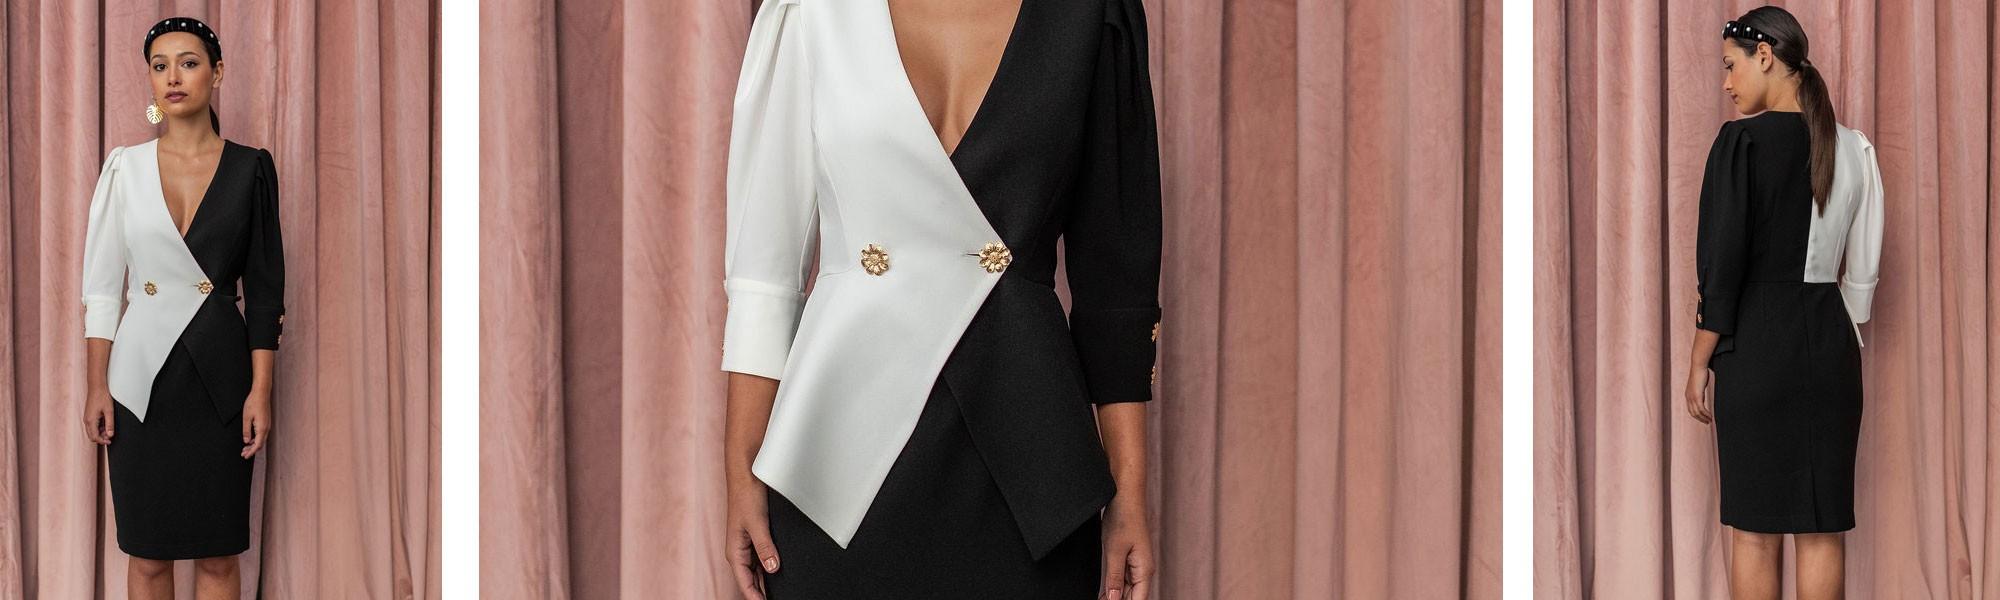 Vestidos invitada boda 2019 online